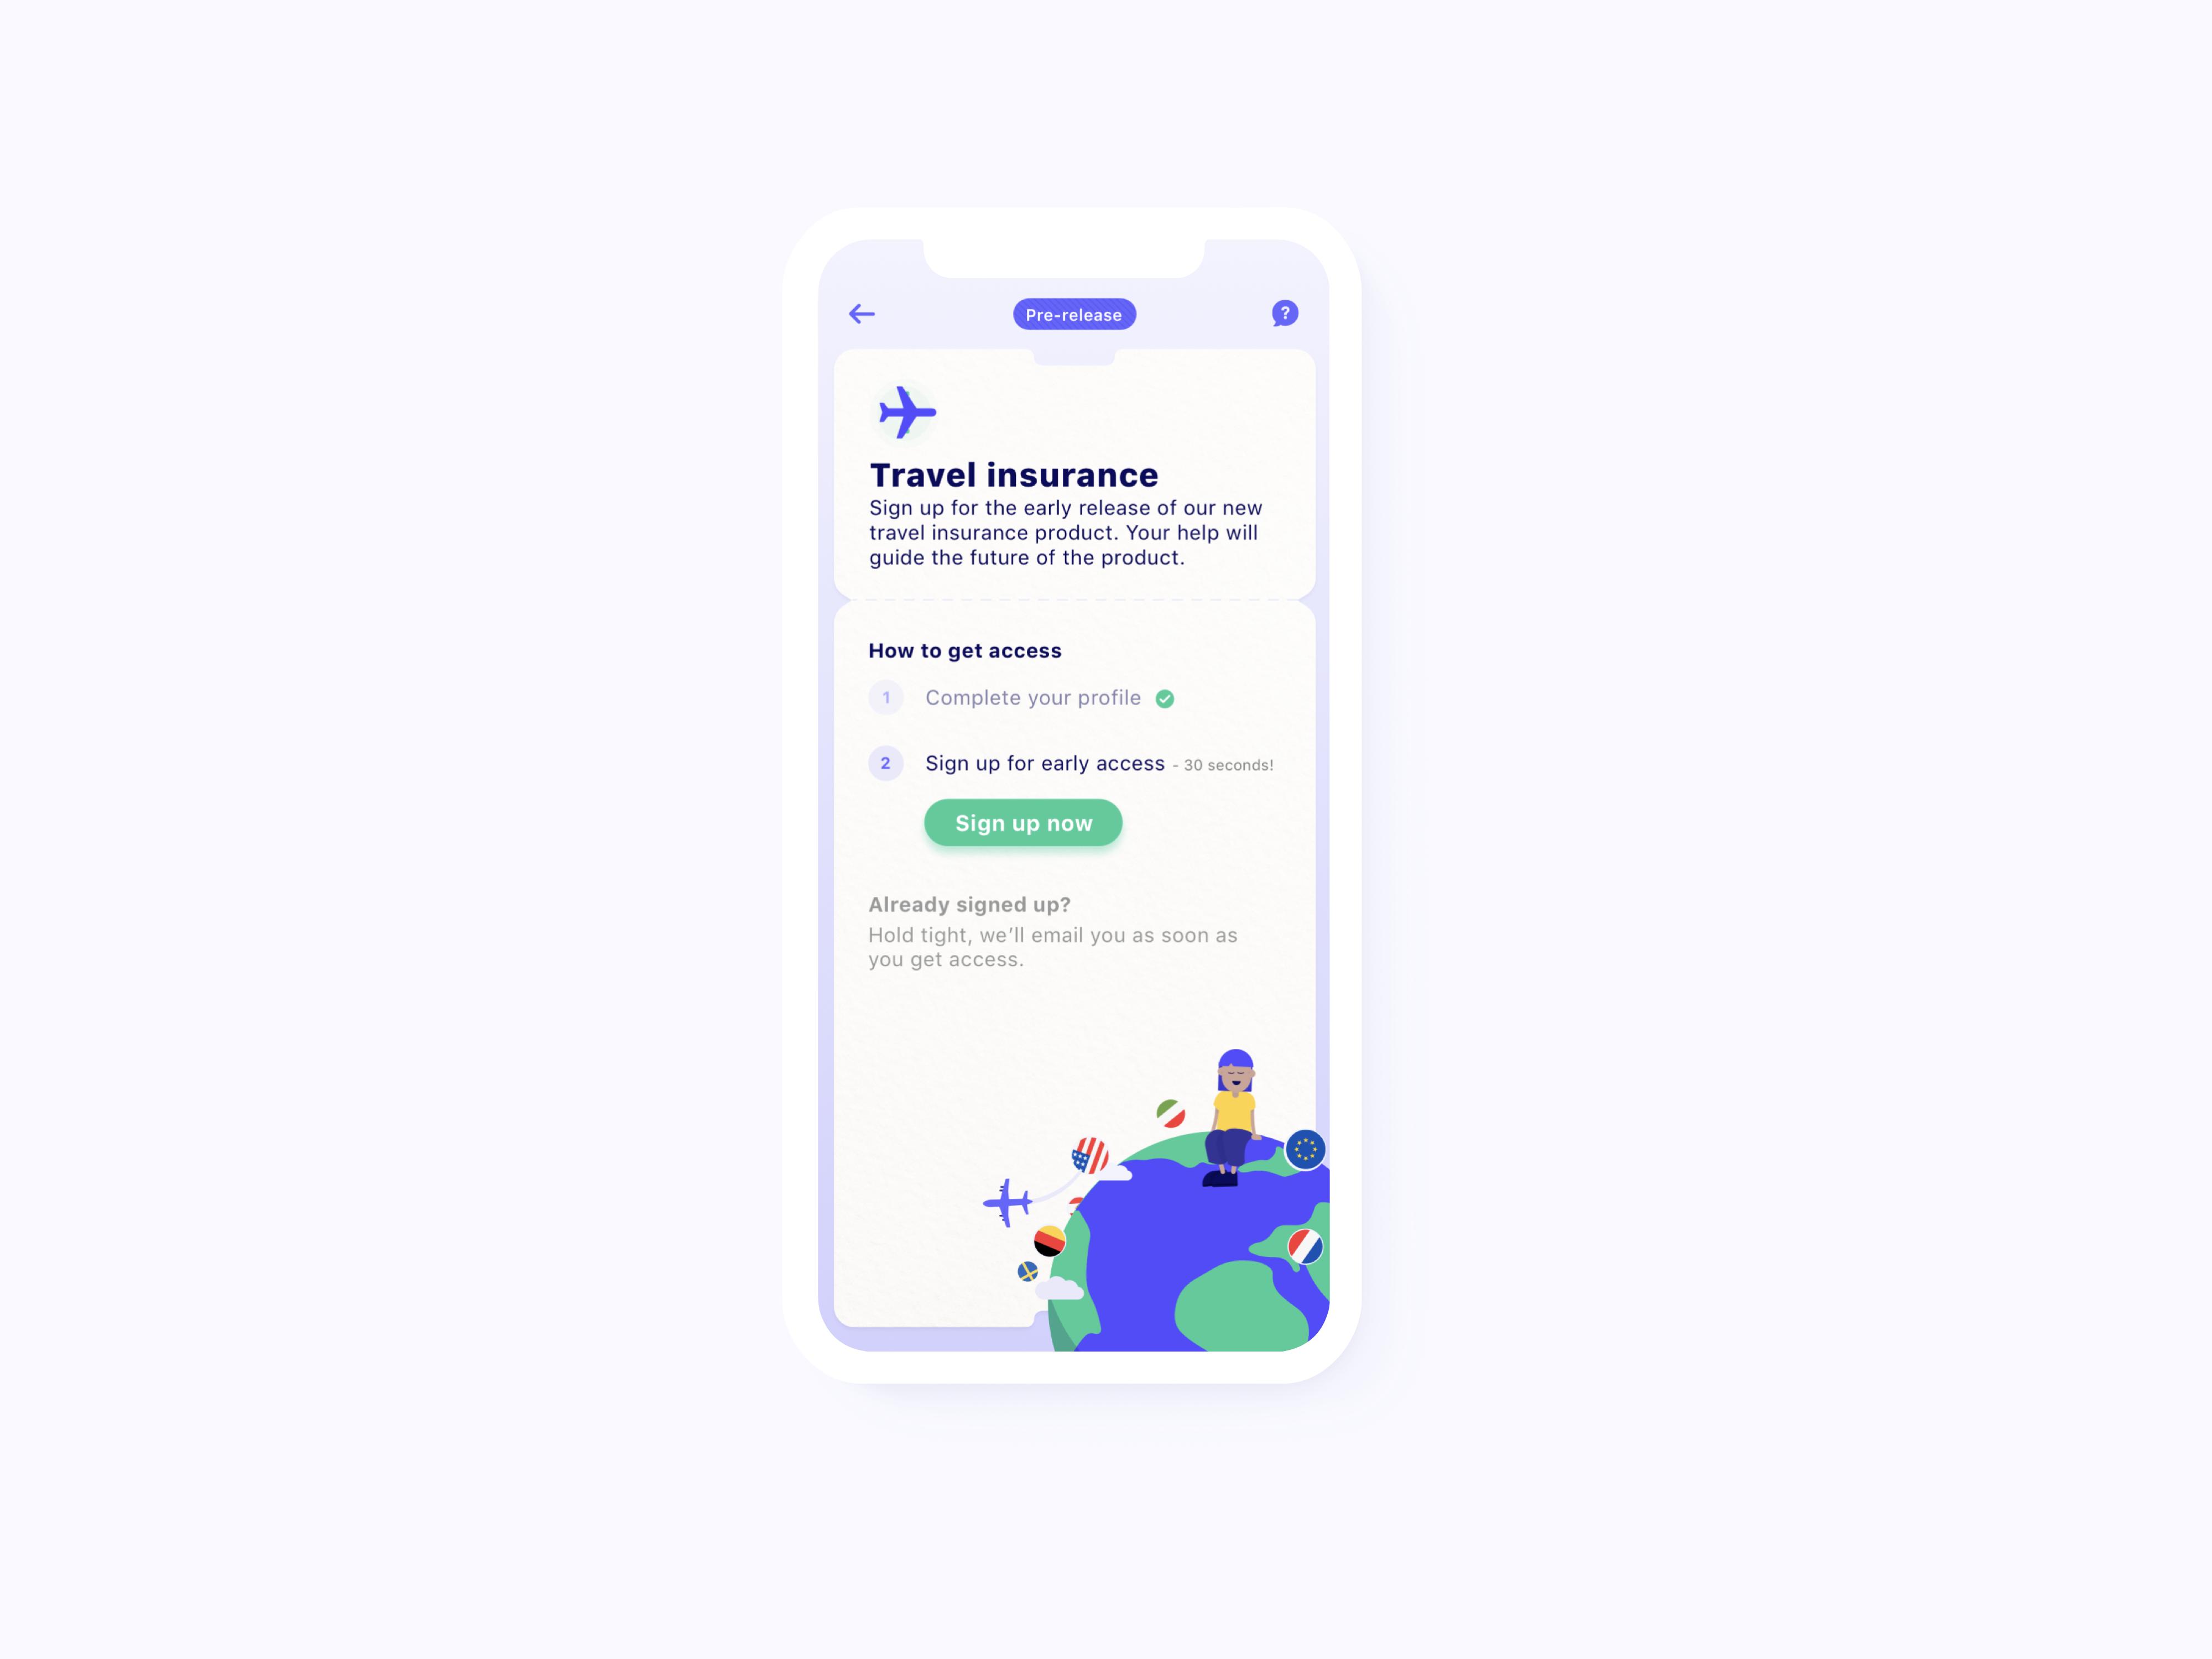 Travel launch in app